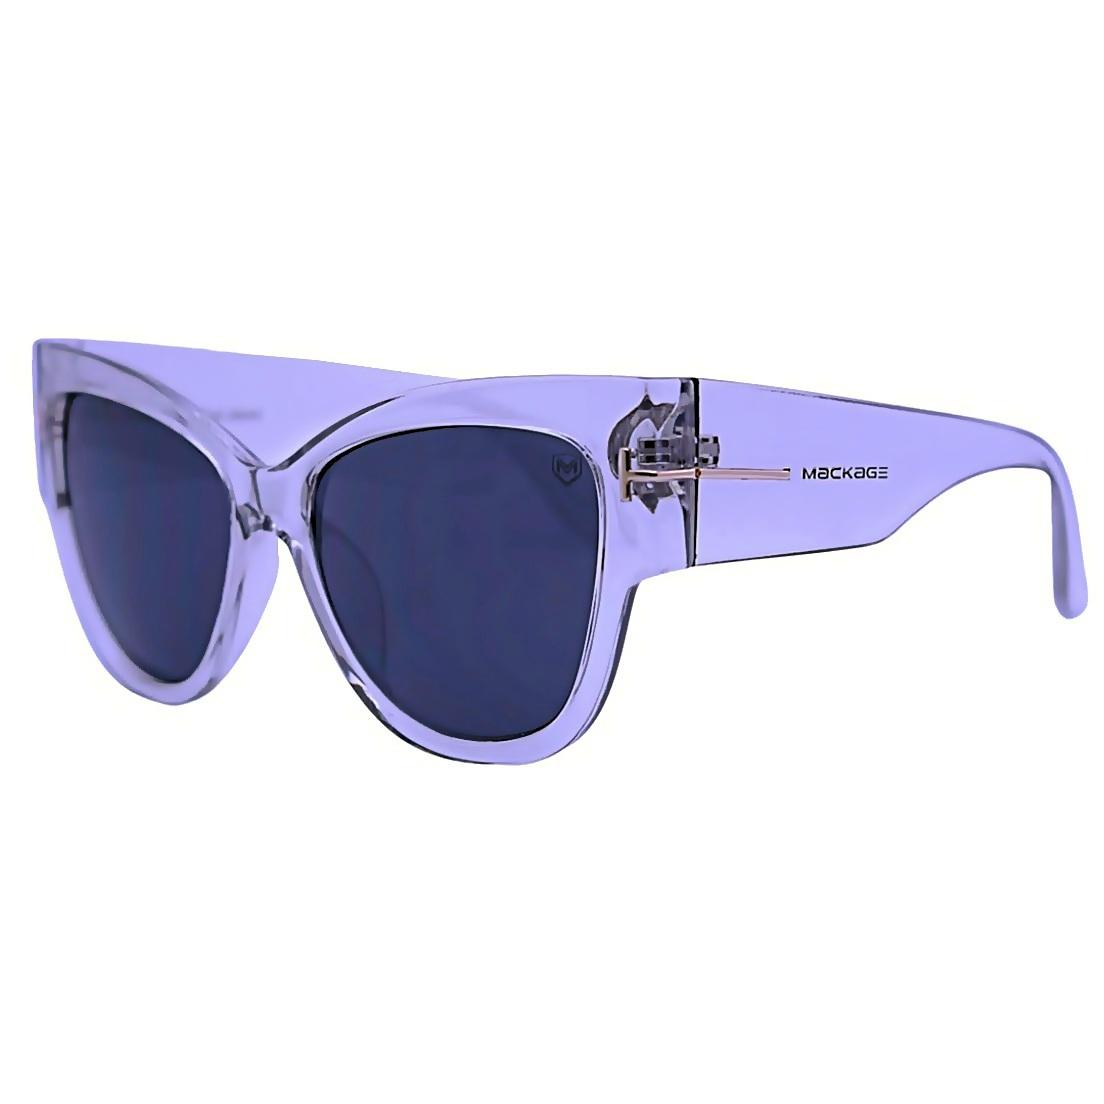 Óculos De Sol Mackage Feminino Acetato Gateado Oversize - Cristal